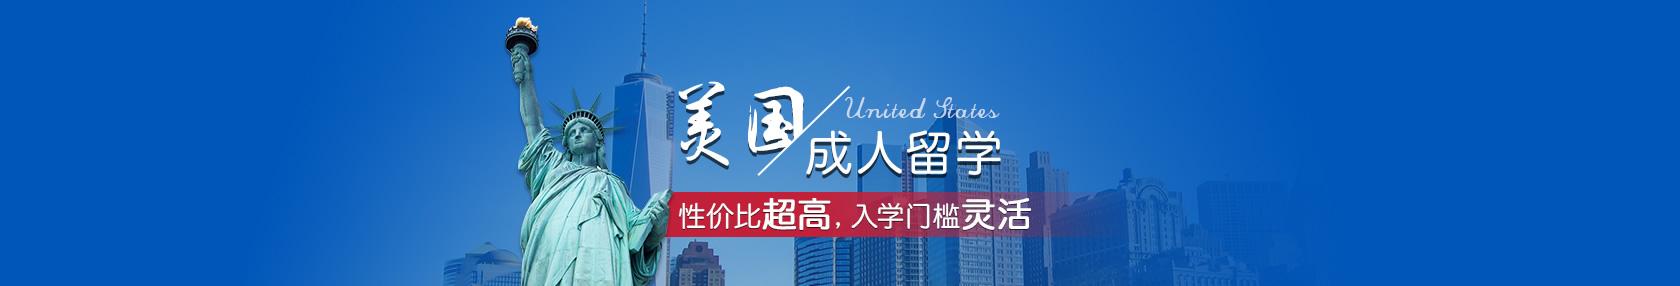 http://m.globevisa.com.cn/news/58877.html